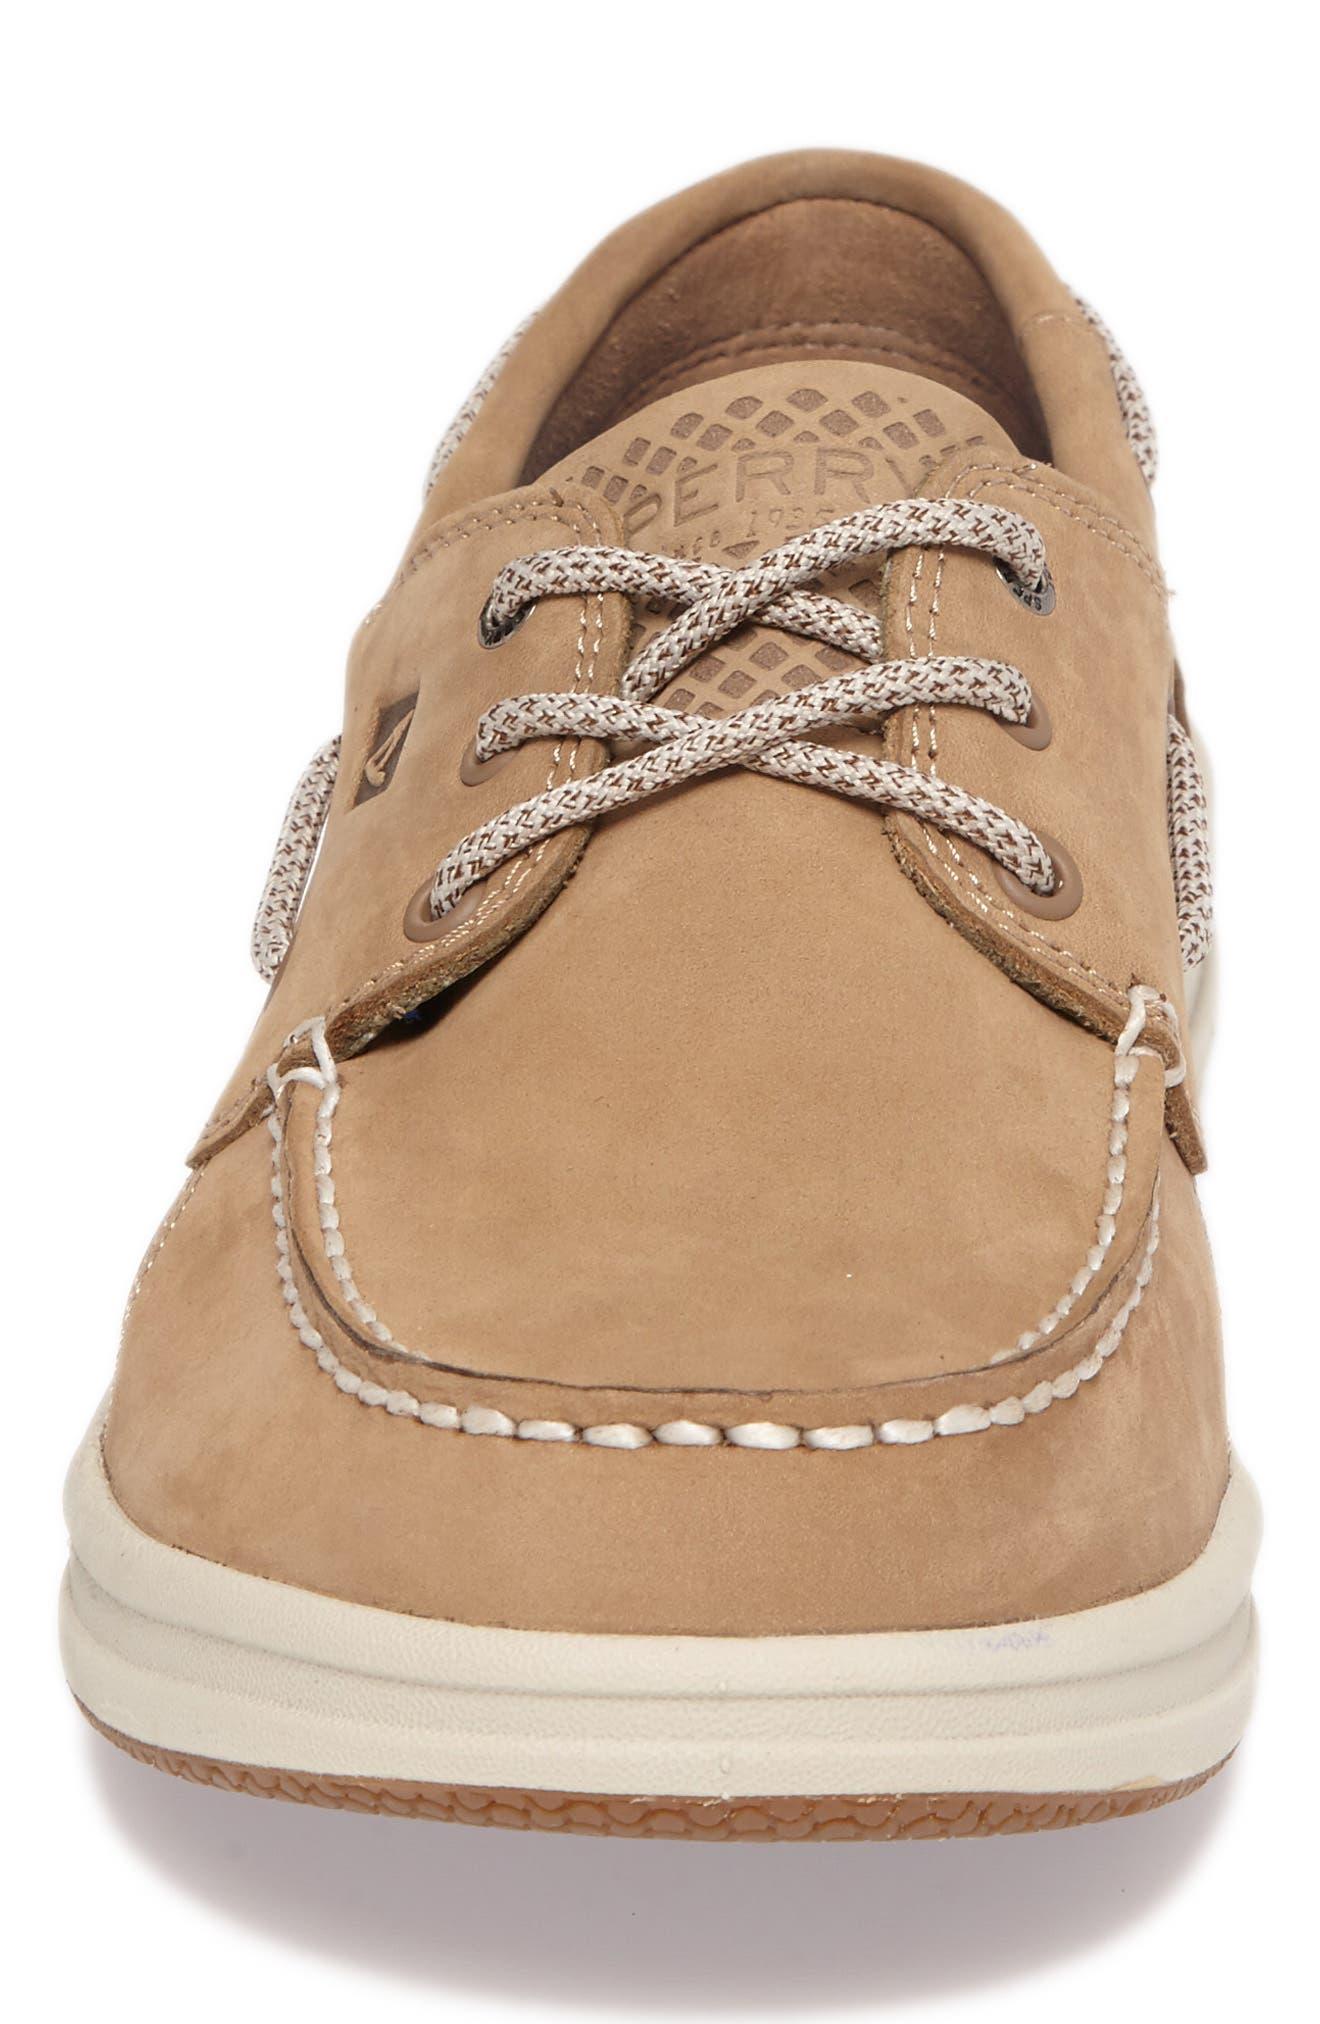 Gamefish Boat Shoe,                             Alternate thumbnail 4, color,                             Linen Leather